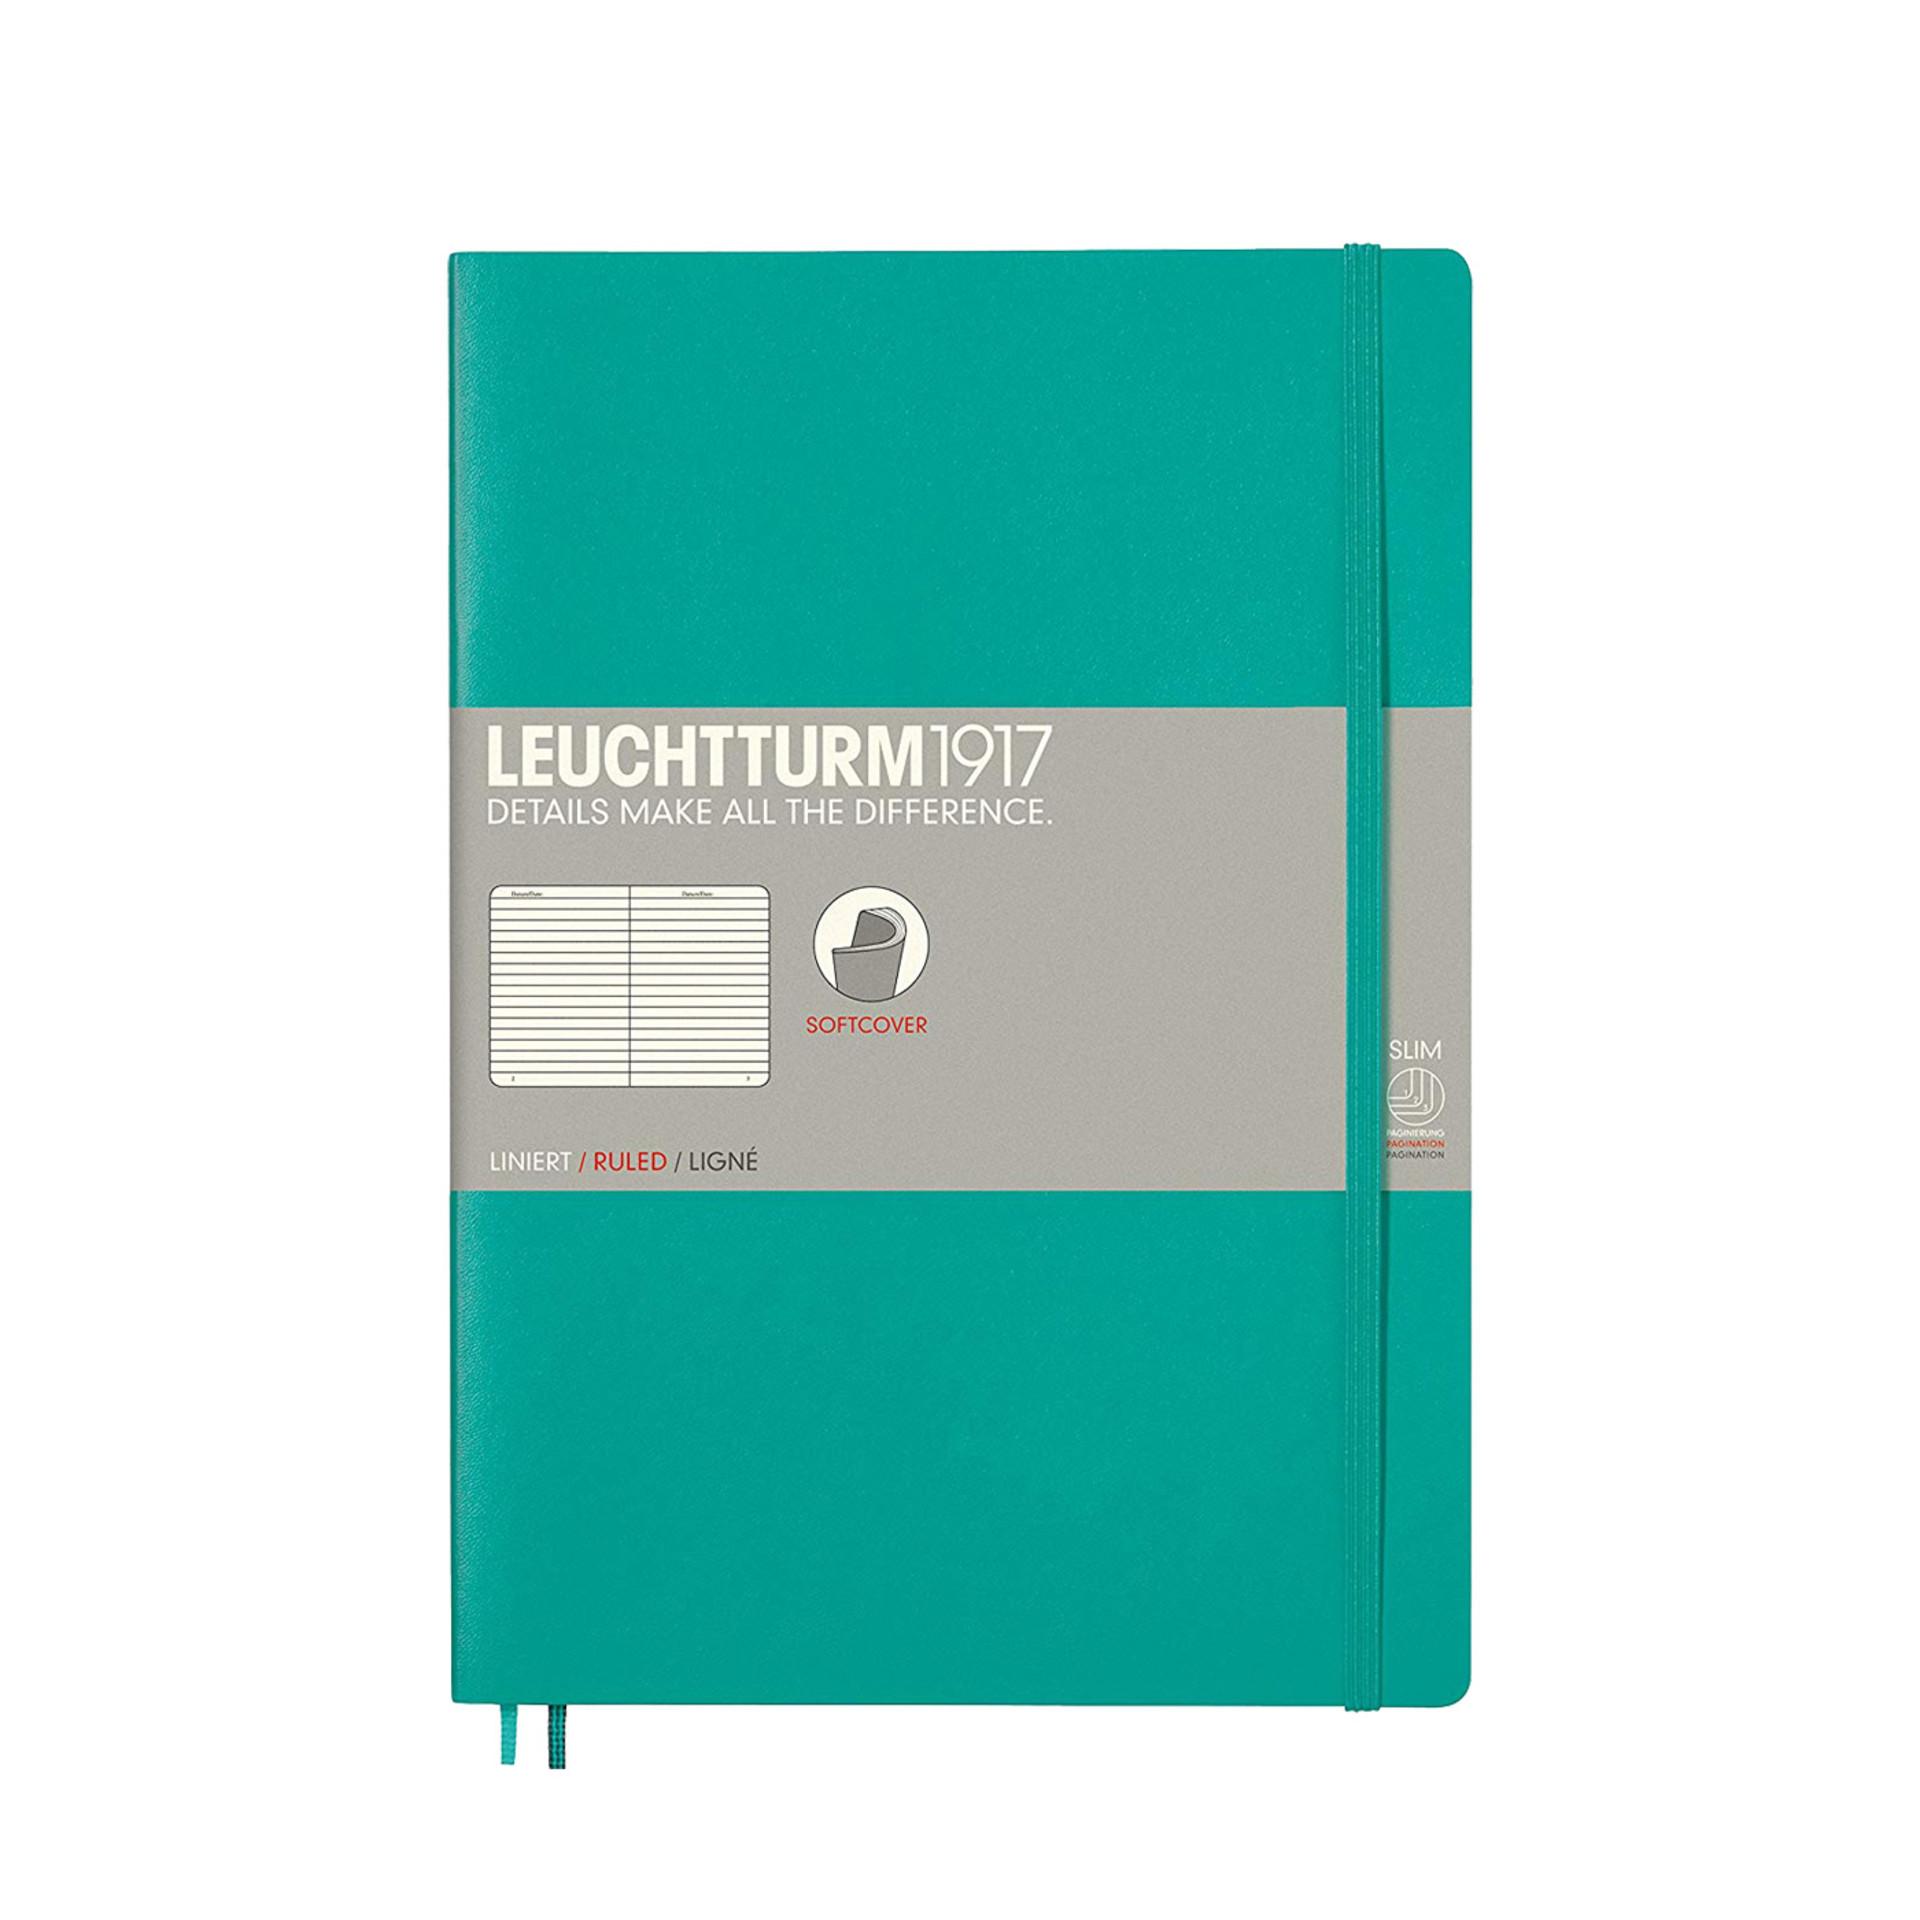 Leuchtturm 1917 B5 Softcover Composition Notebook Emerald Ruled